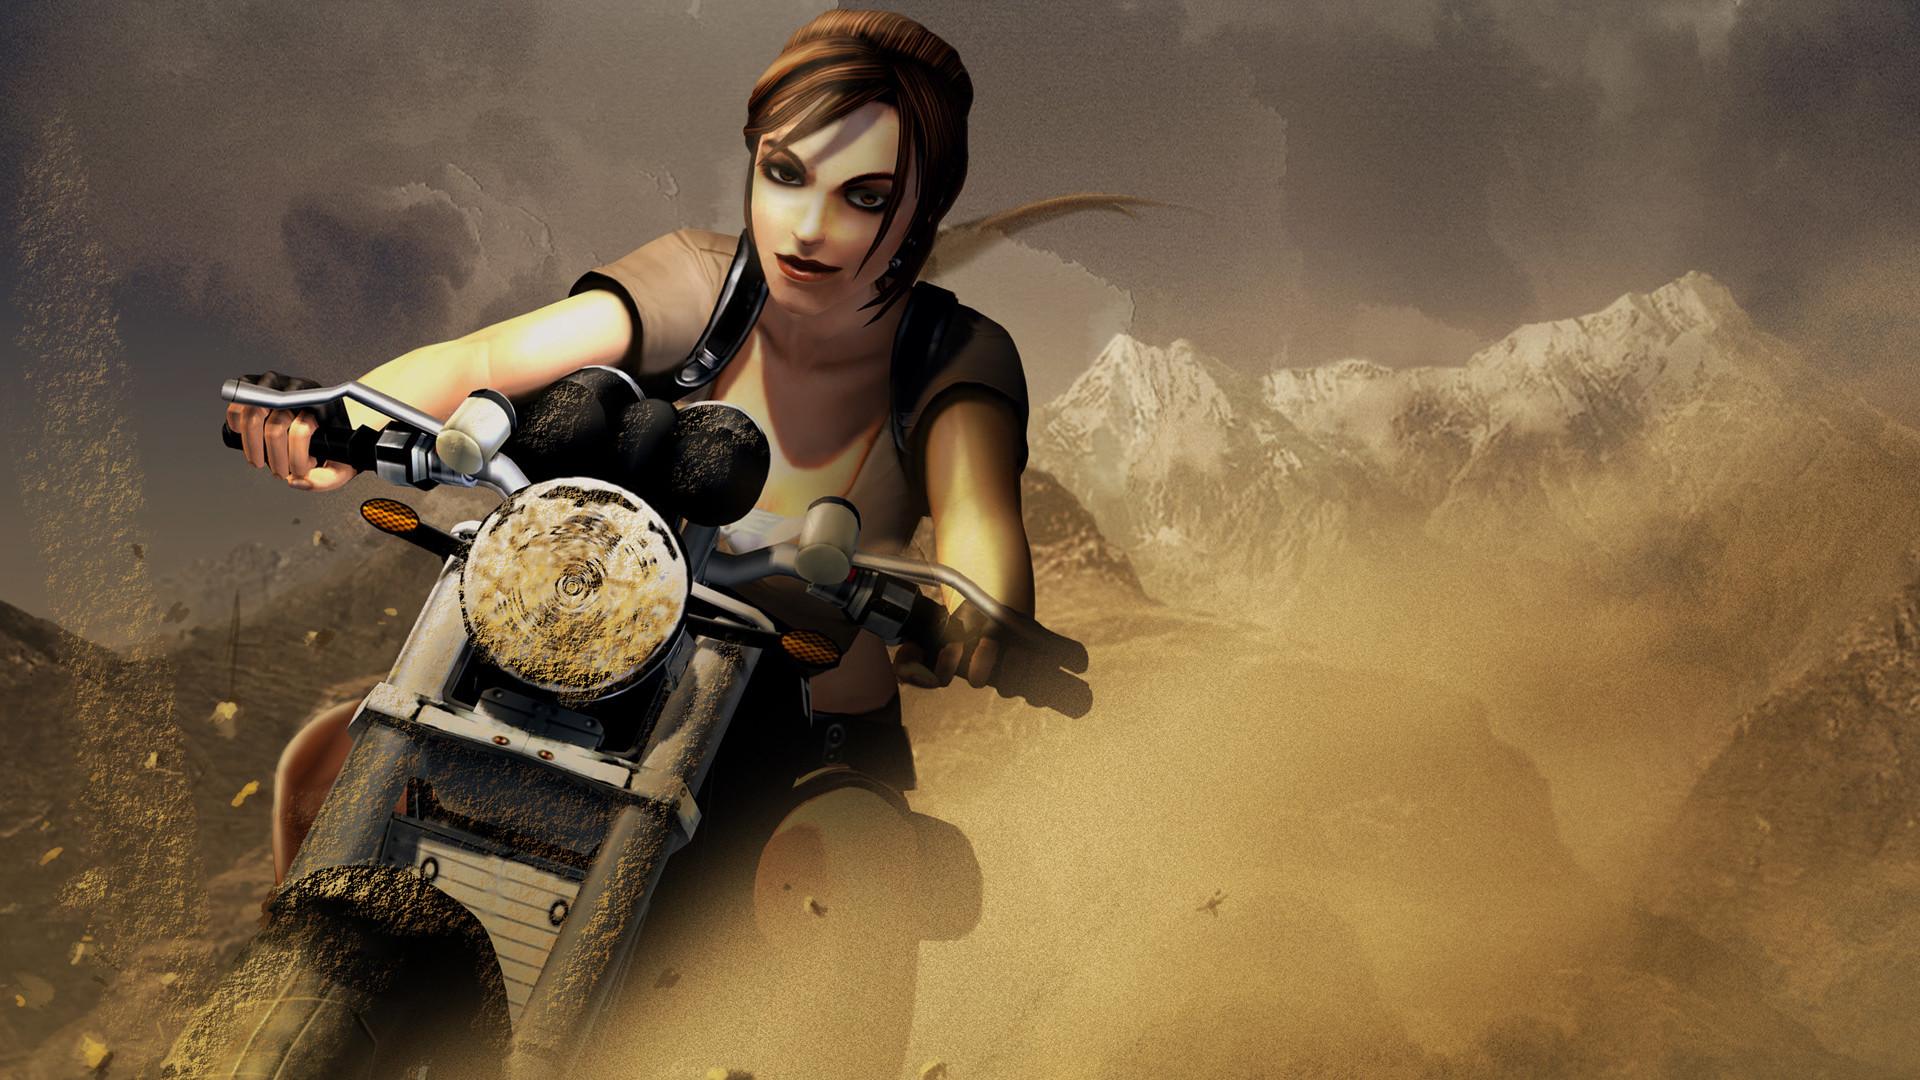 Tomb Raider 2018 HD Wallpaper (76+ images)  Tomb Raider 201...